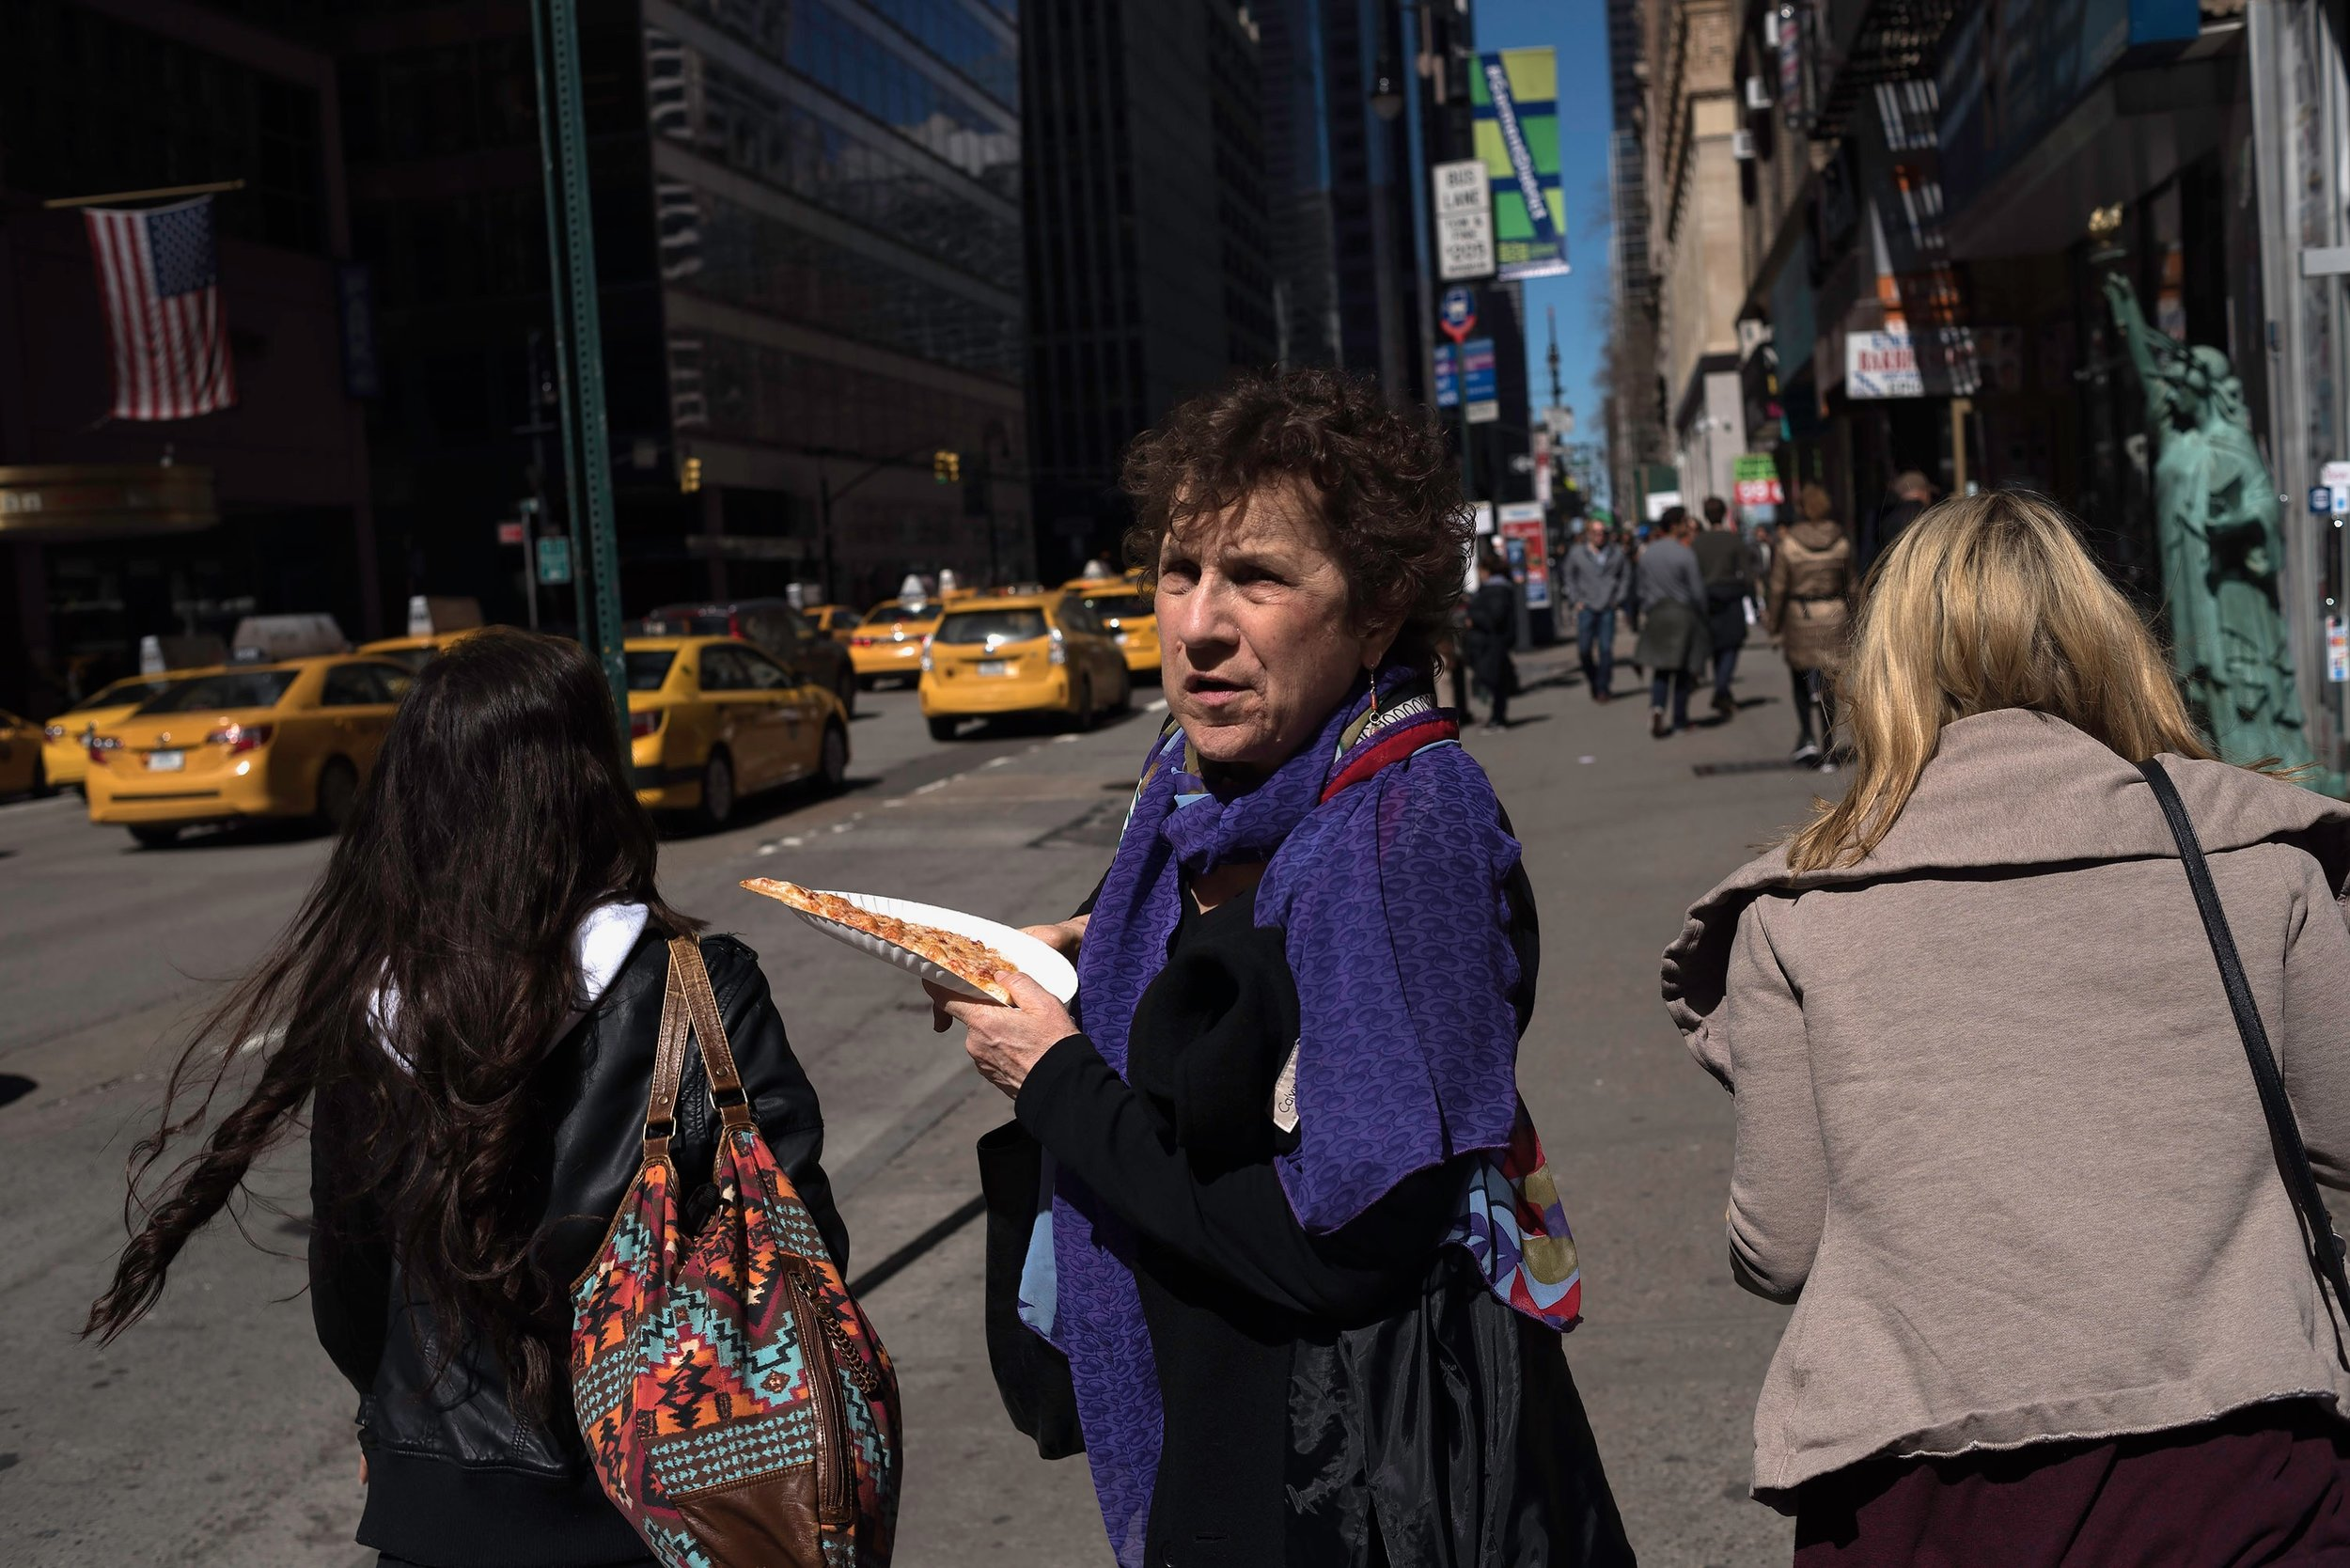 new-york-city-street-photography-collective-frank-multari-7